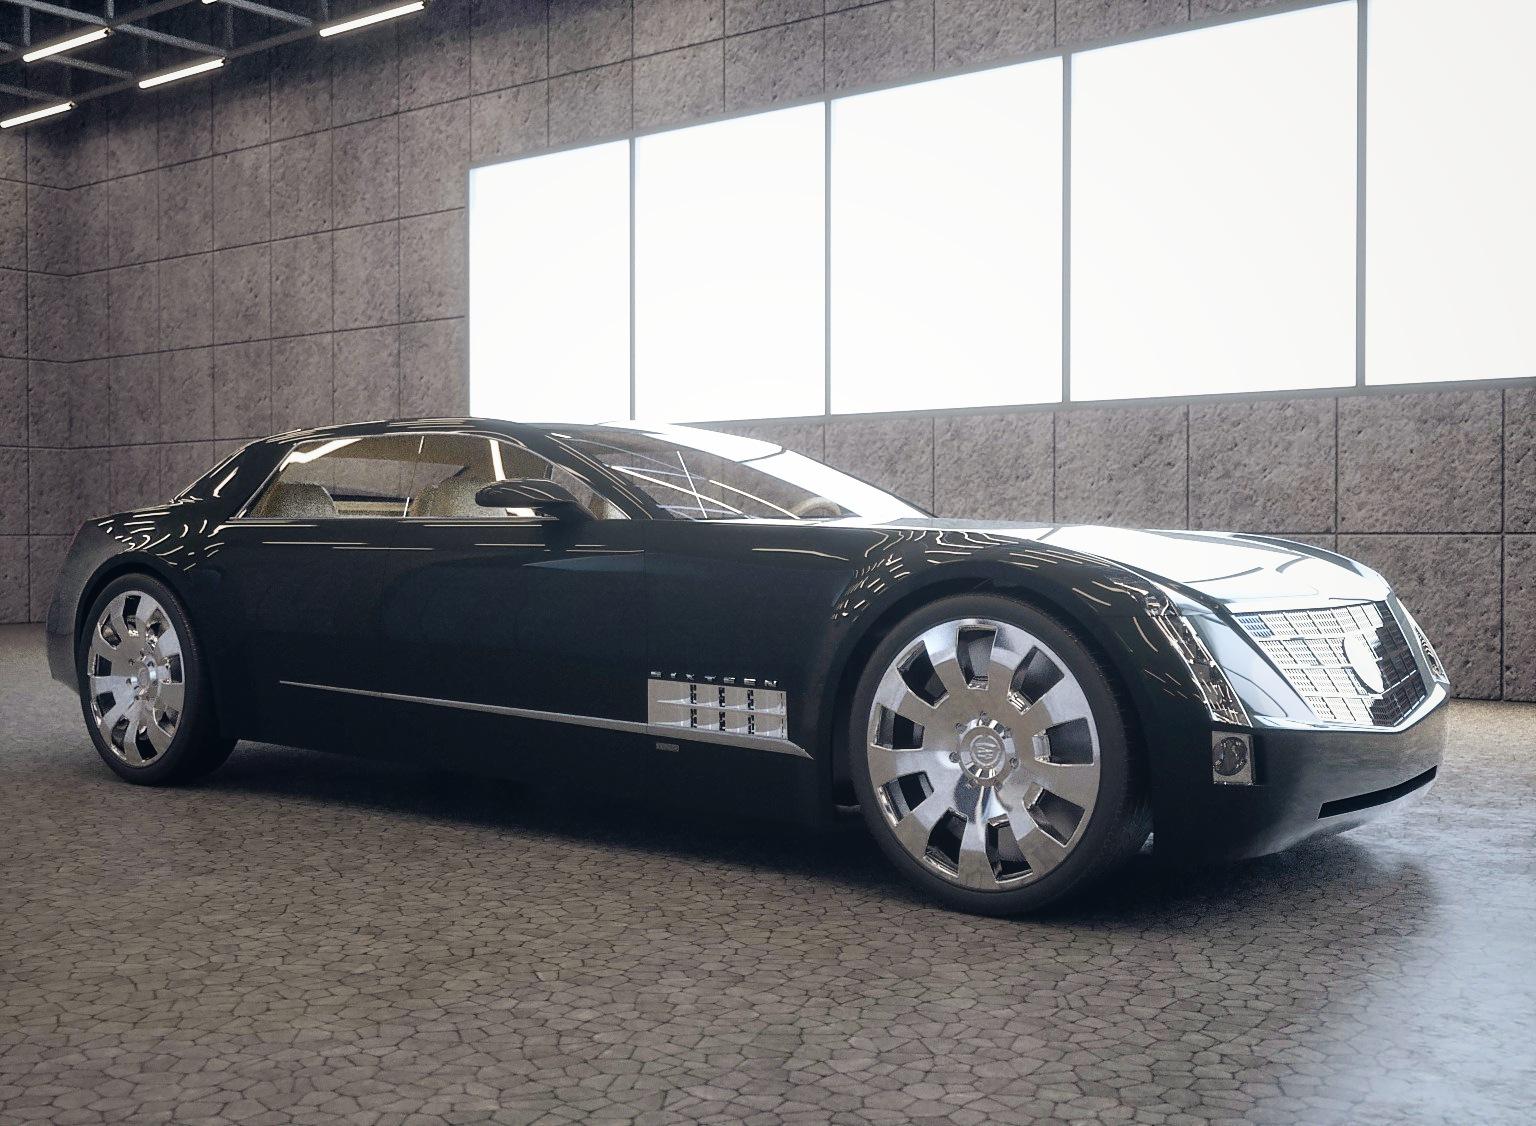 Cadillac Sixteen Concept Luxury Sedan Sandykoufax